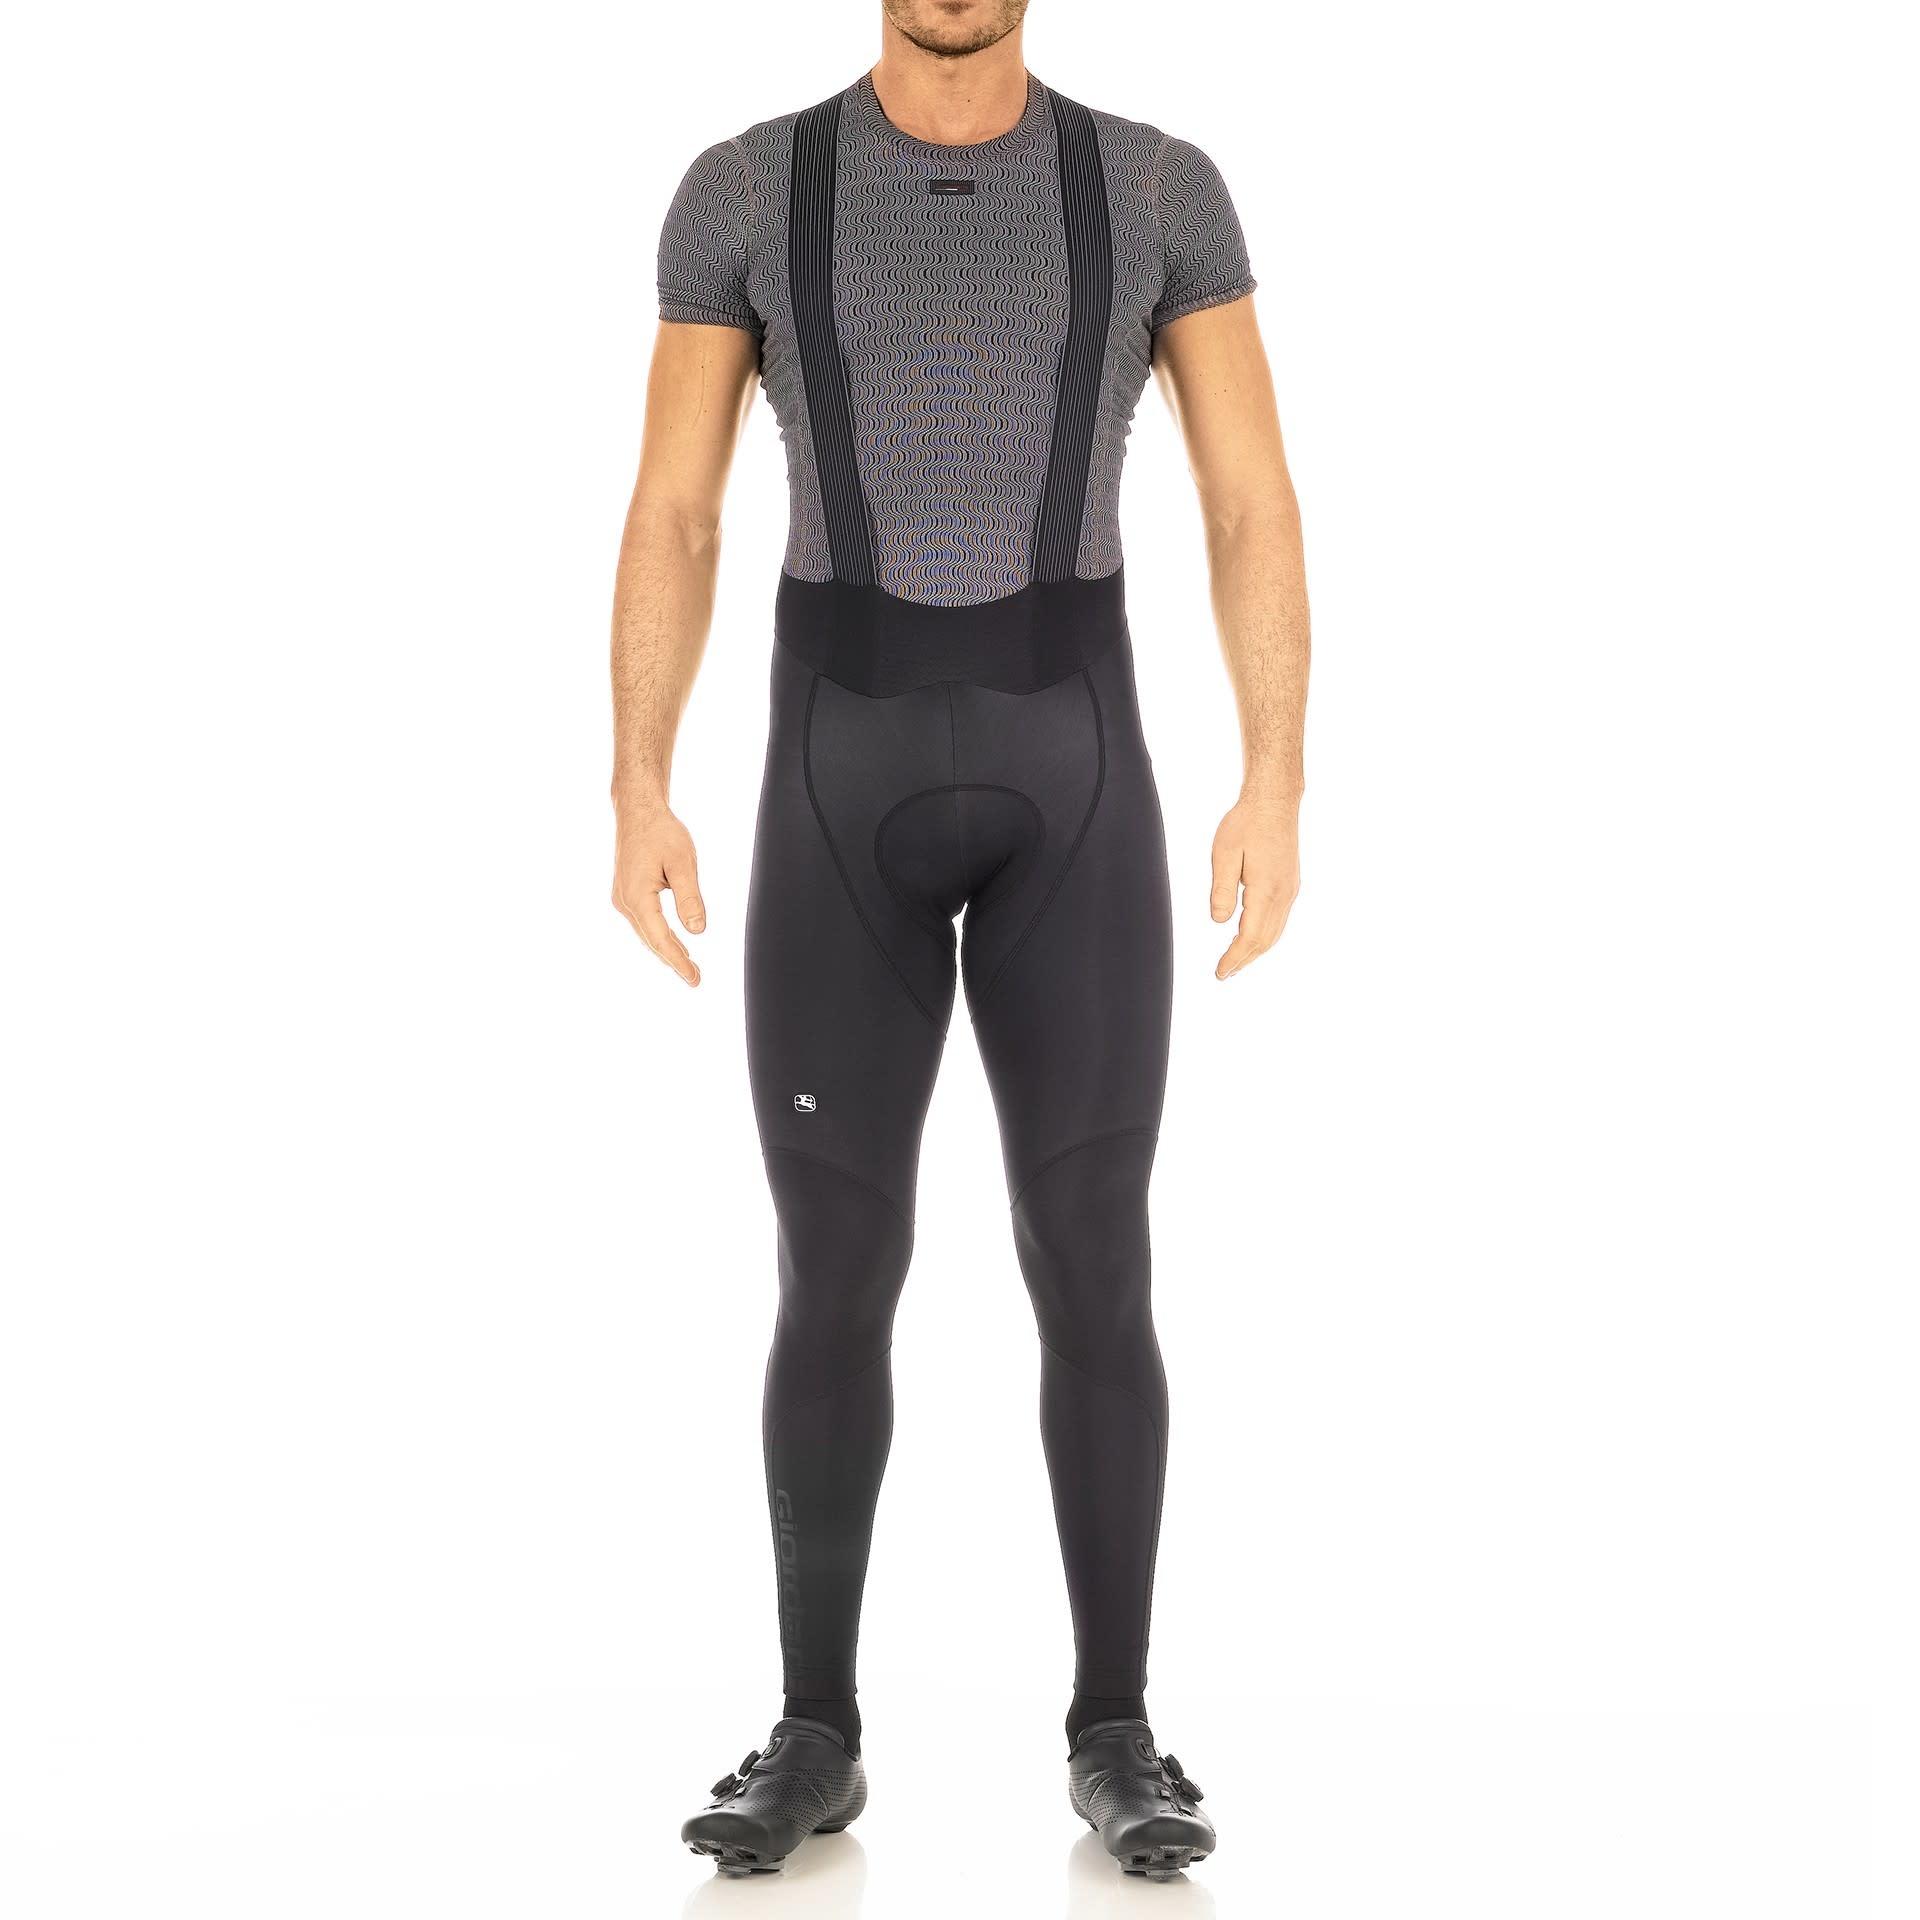 Giordana Giordana FRC Pro thermal bib tights Black L